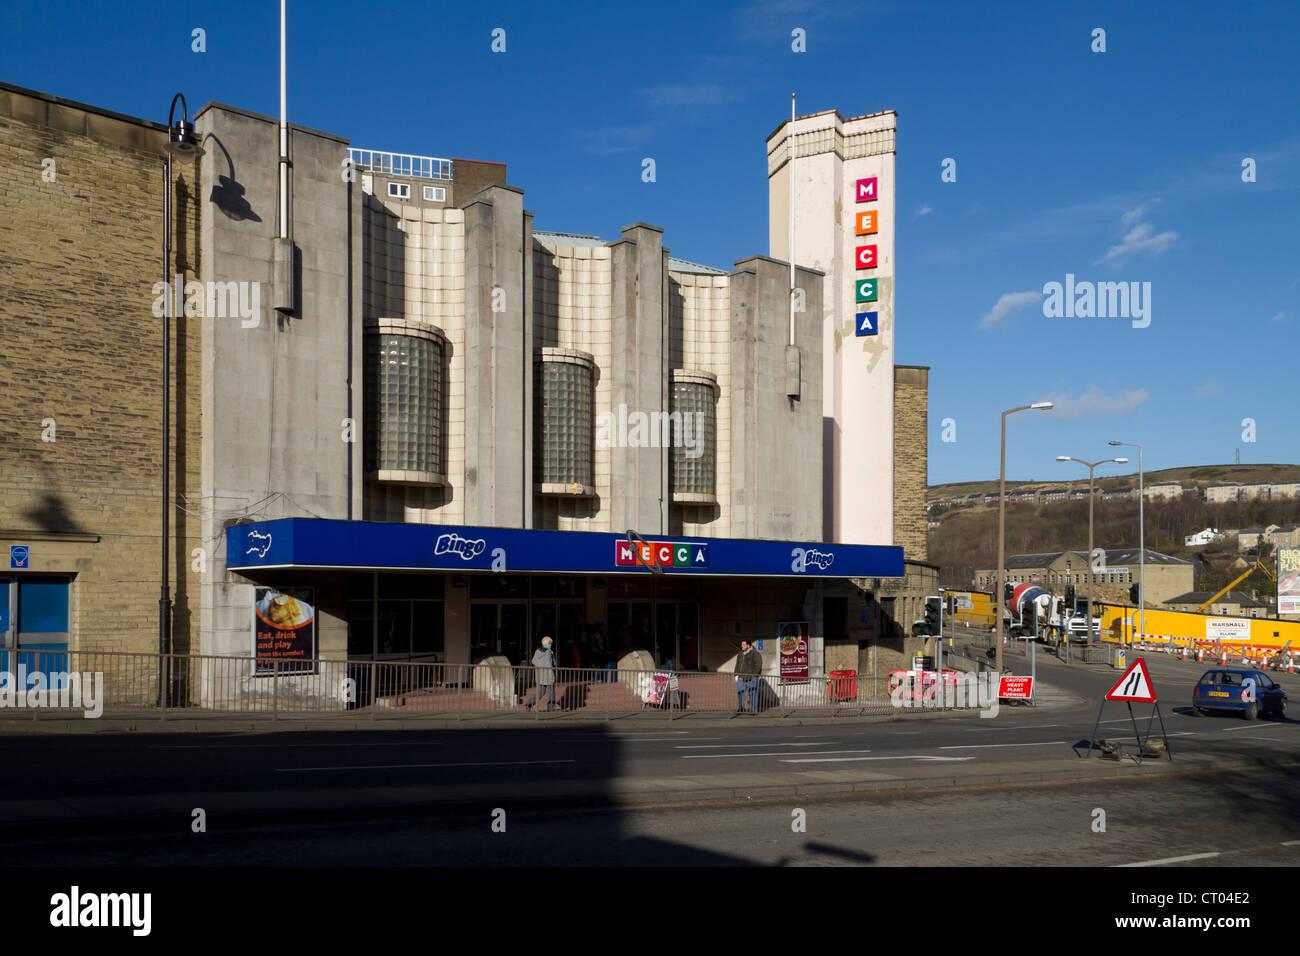 Halifax Bingo